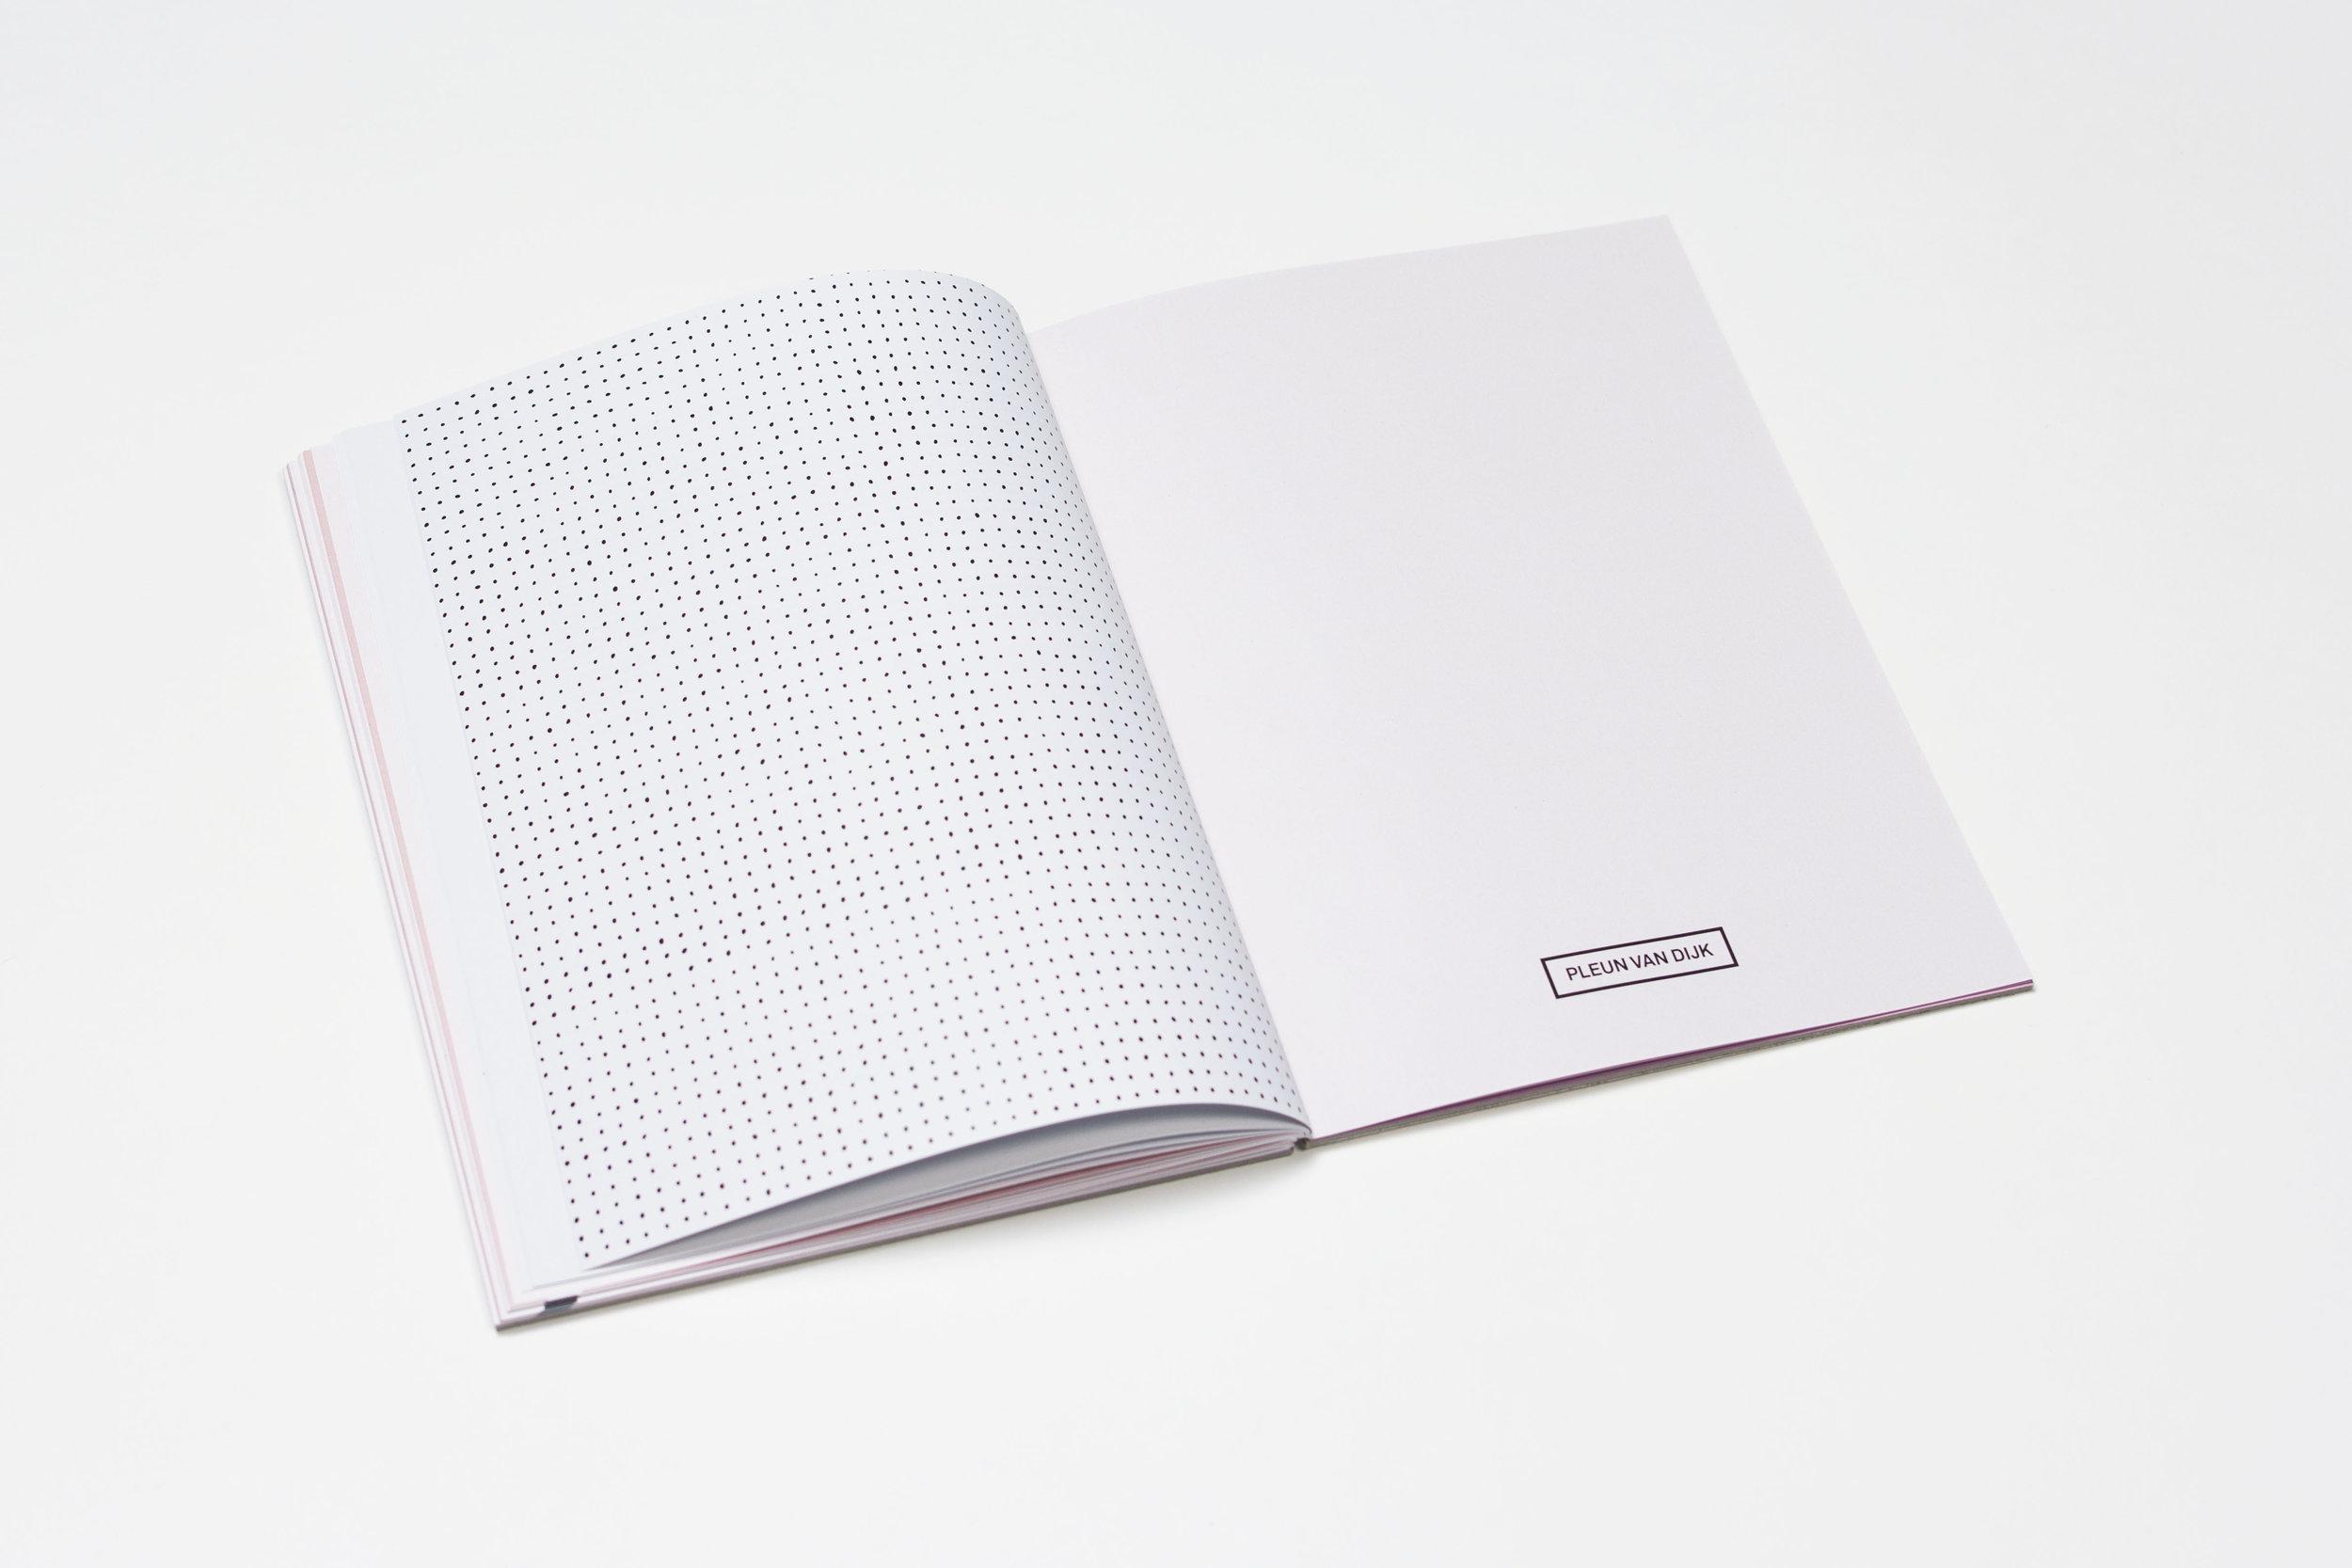 Reborn_Thesis_Book_031.jpg